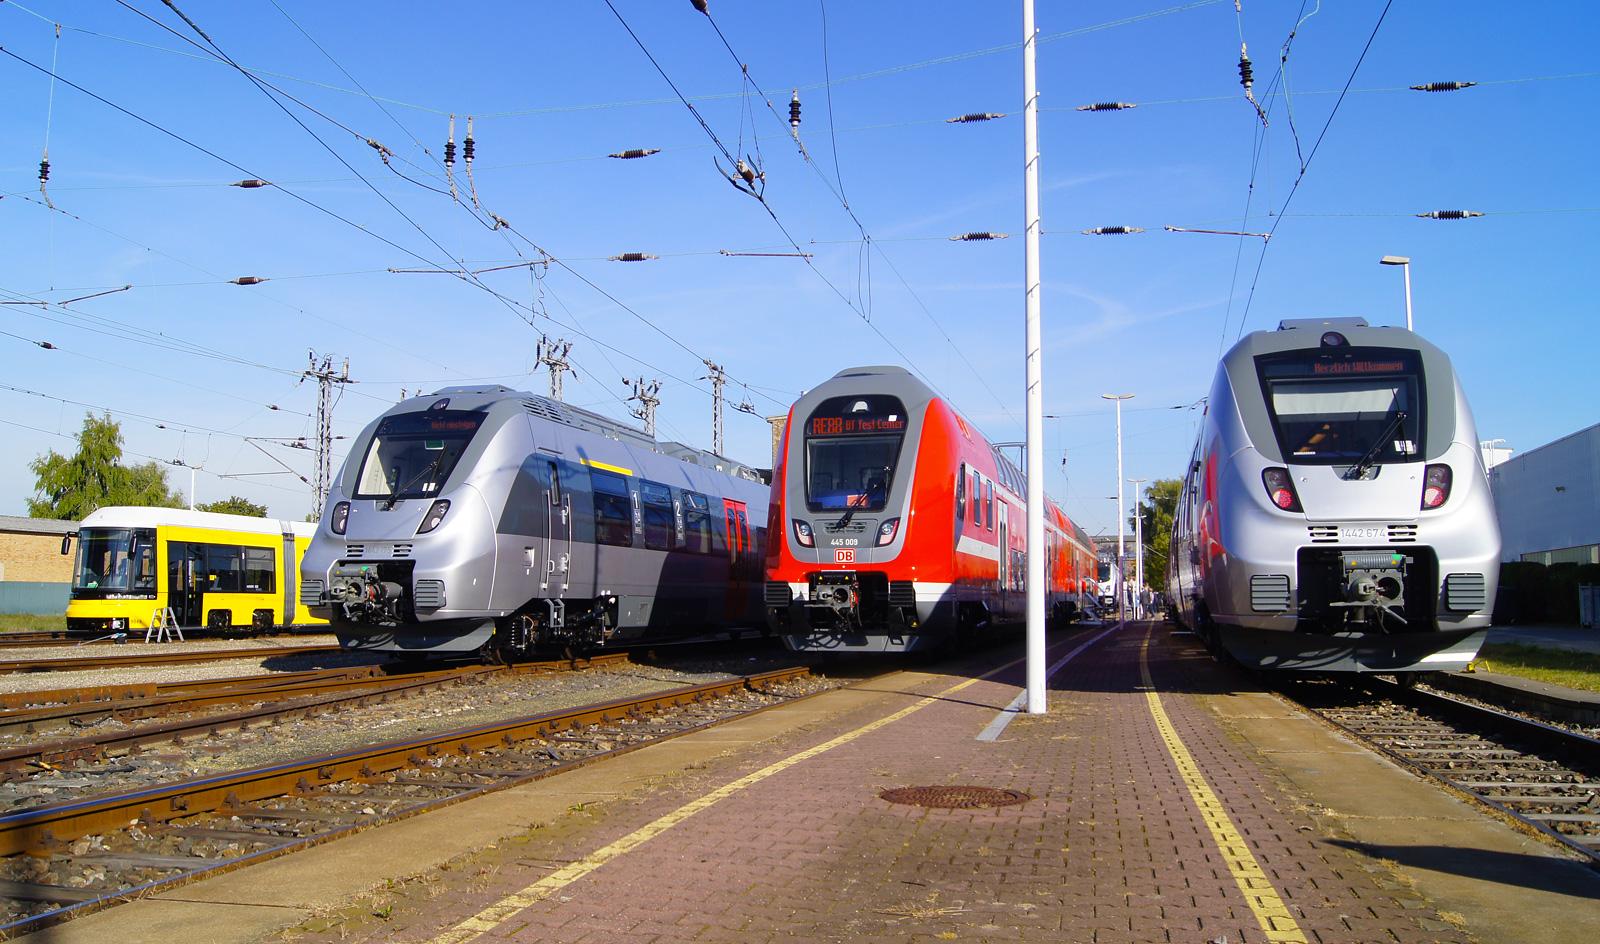 Bombarder line-up: Flexity Berlin - Abellio Talent2 - DB Regio Twindexx Vario - Abellio Talent2